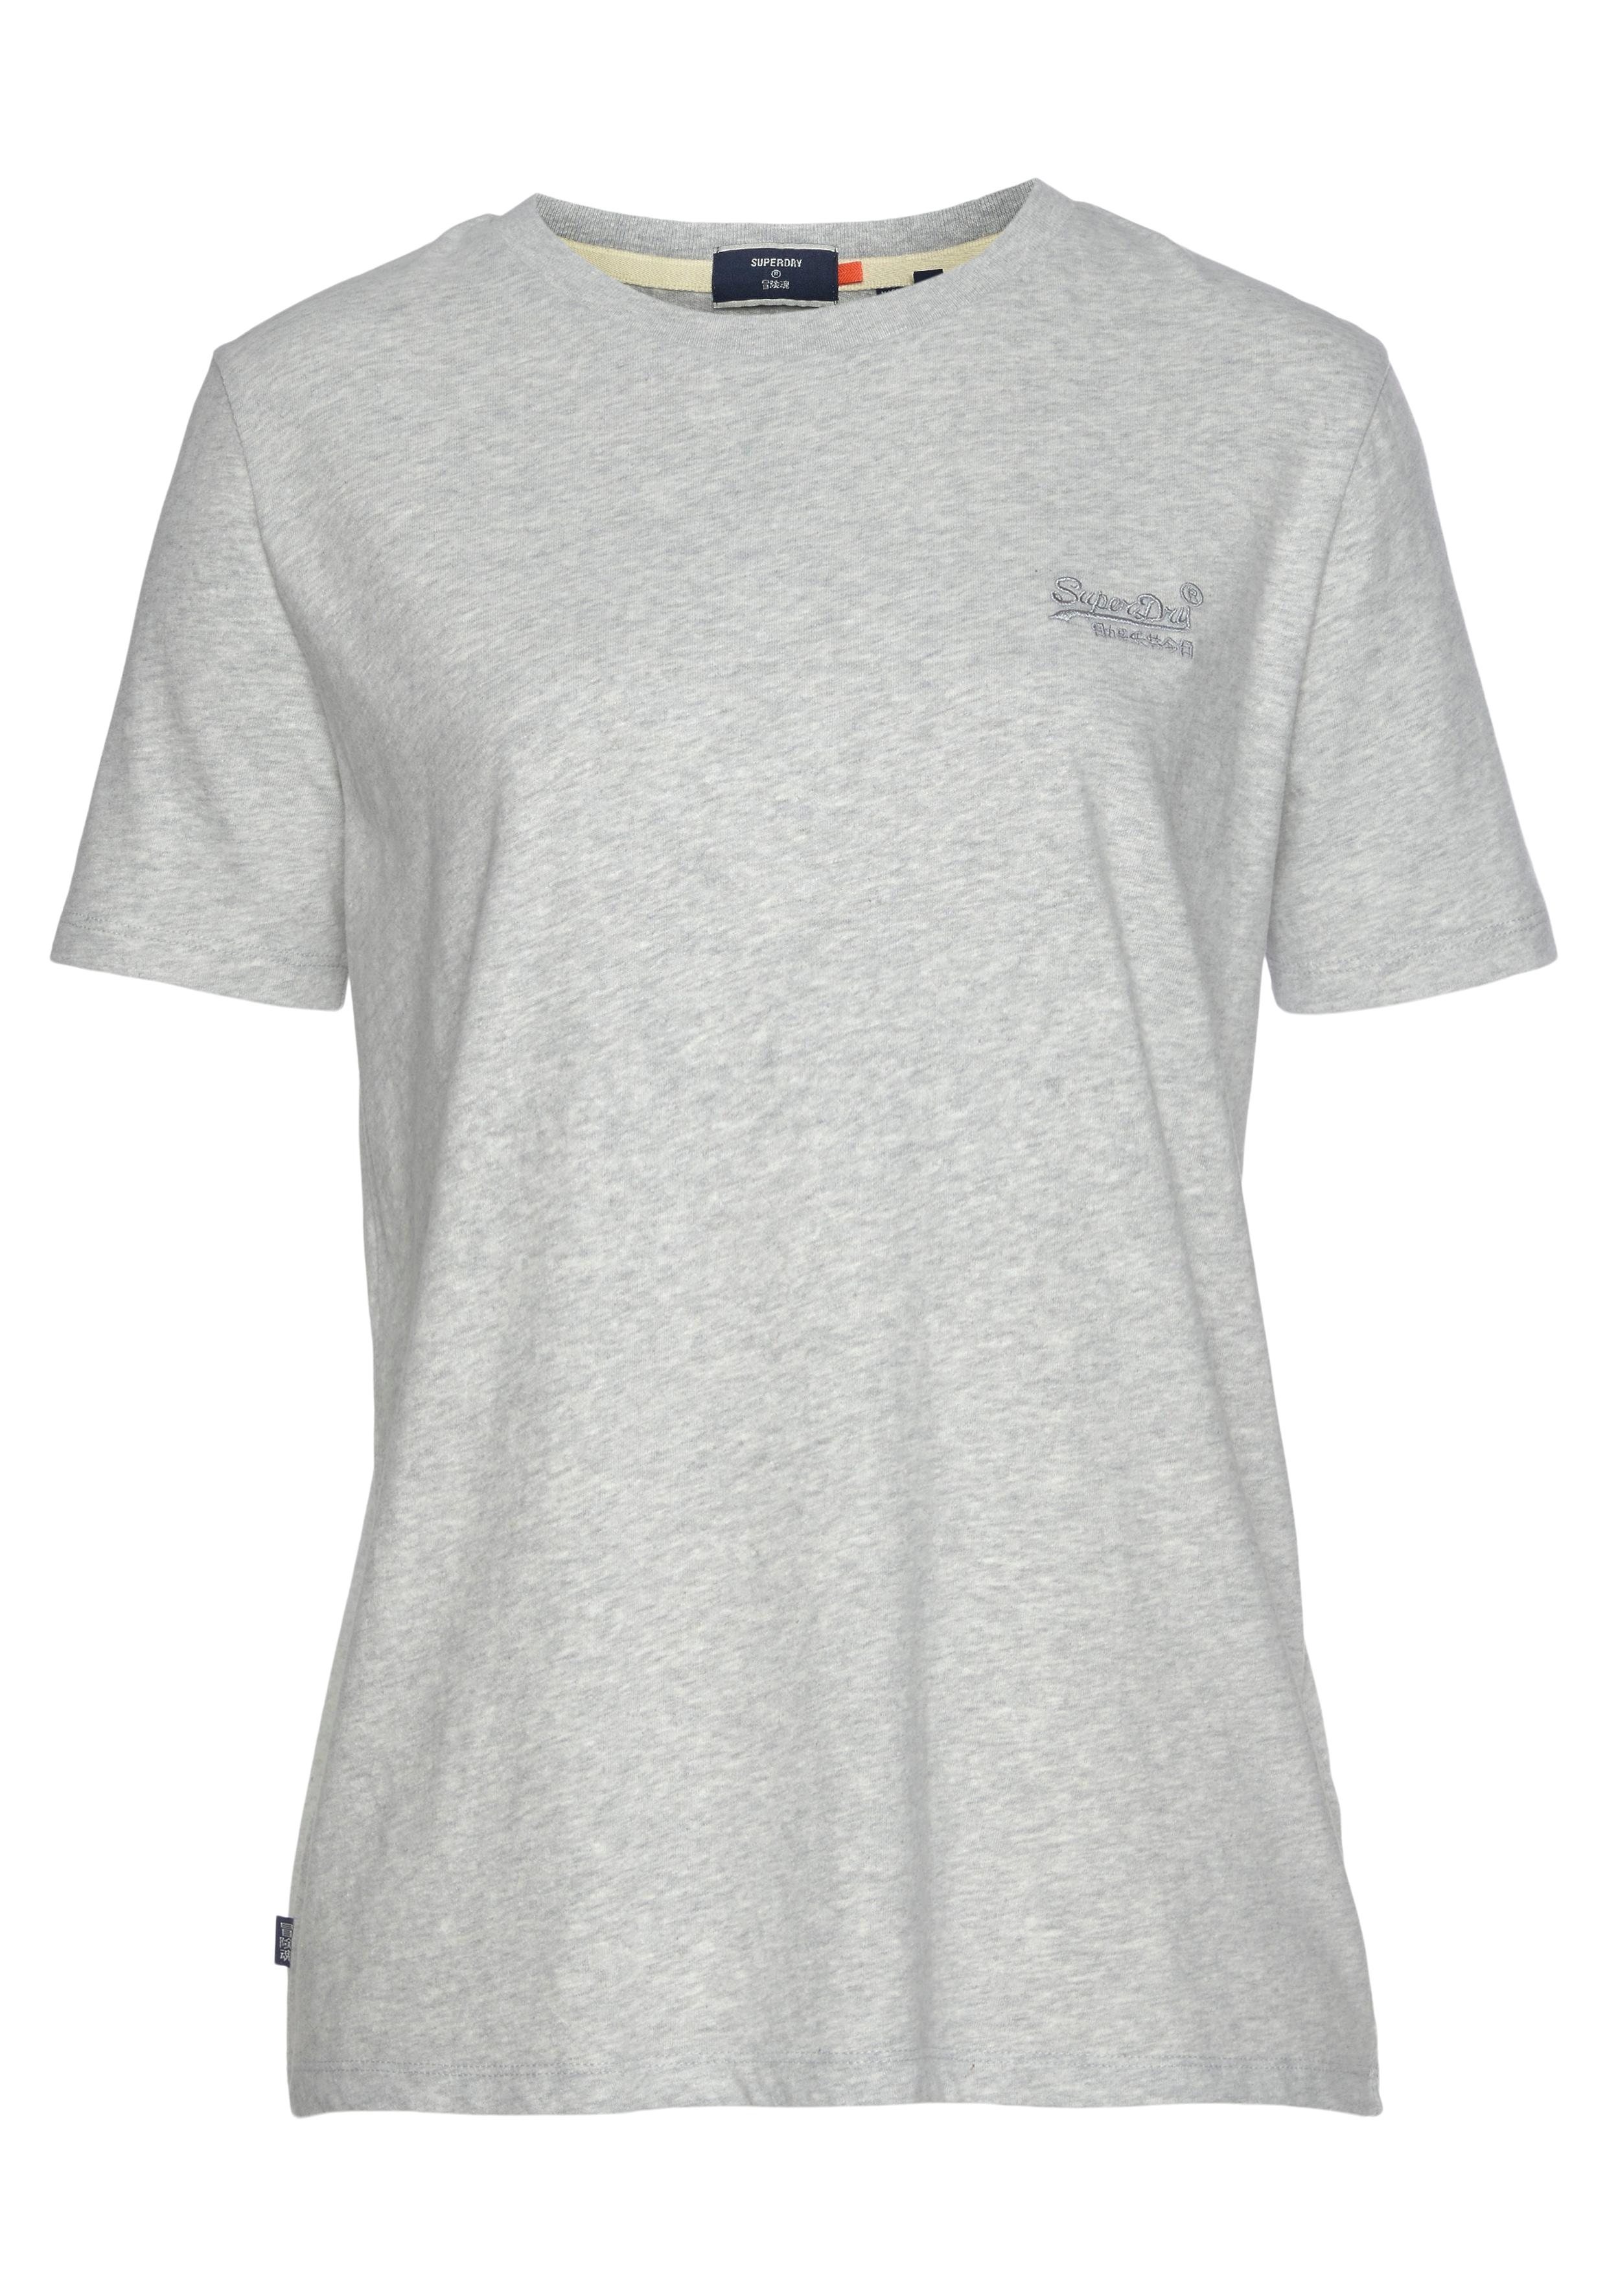 superdry -  T-Shirt ORANGE LABEL CLASSIC TEE, aus Bio-Baumwolle